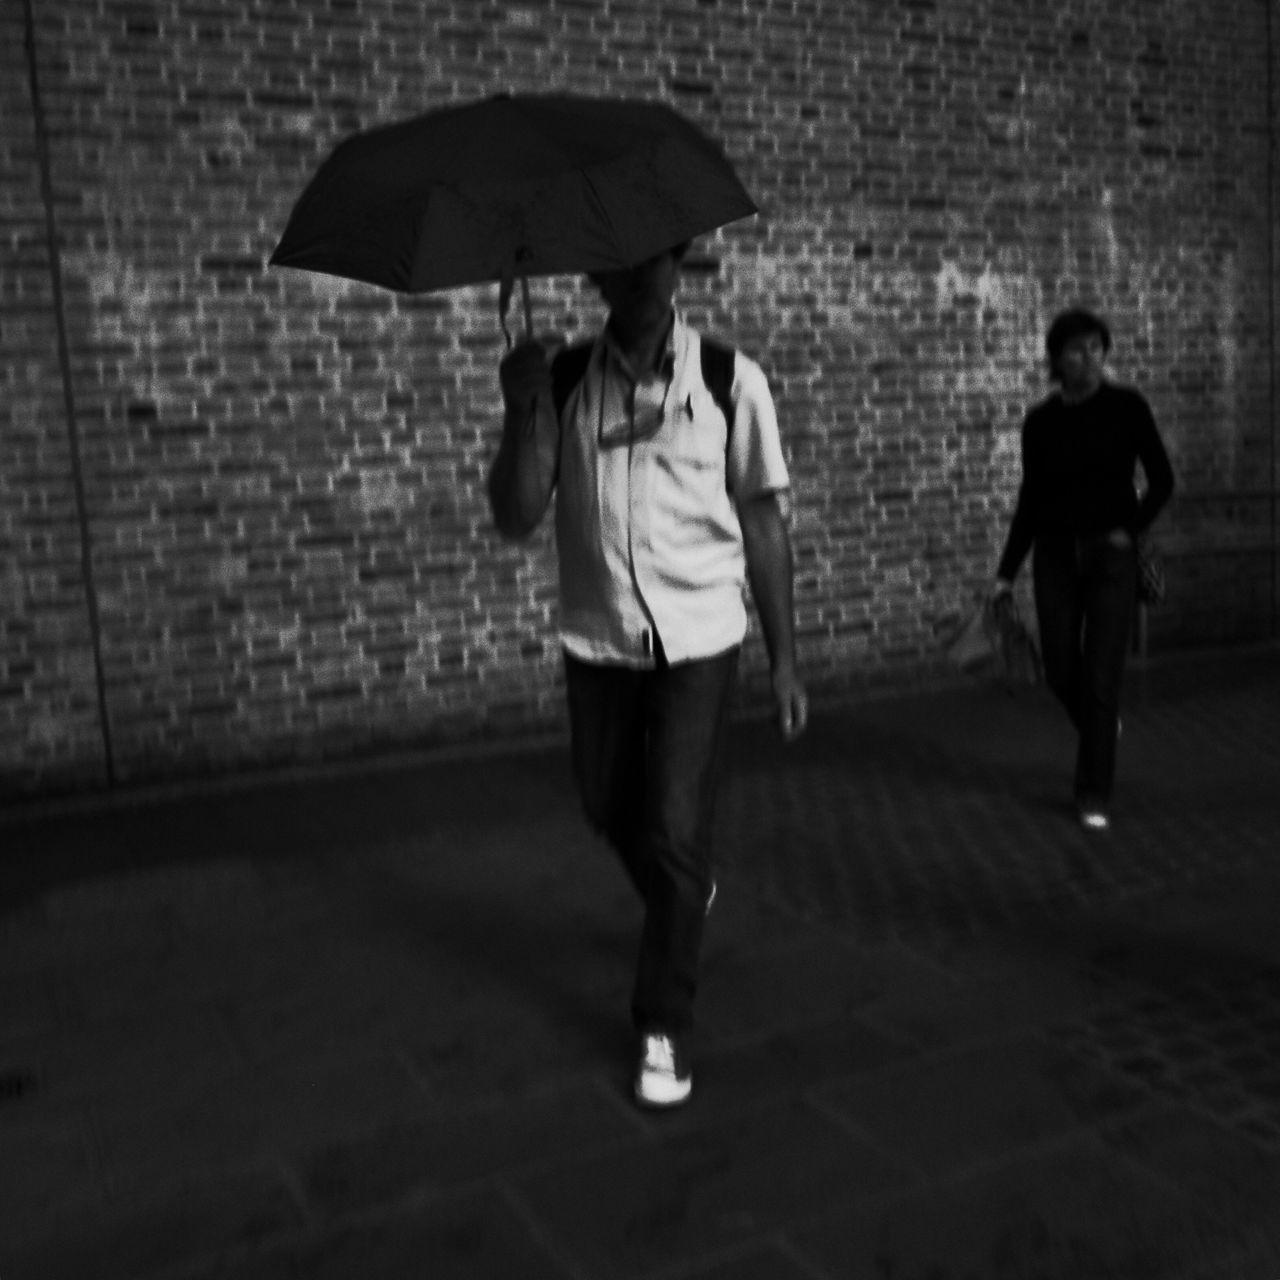 Streetphotography Streetphotography_bw Flaneur Monochrome Blackandwhite Streettogs Streetphoto_bw NEM Black&white Walking Around Ricoh Gr Blancoynegro London